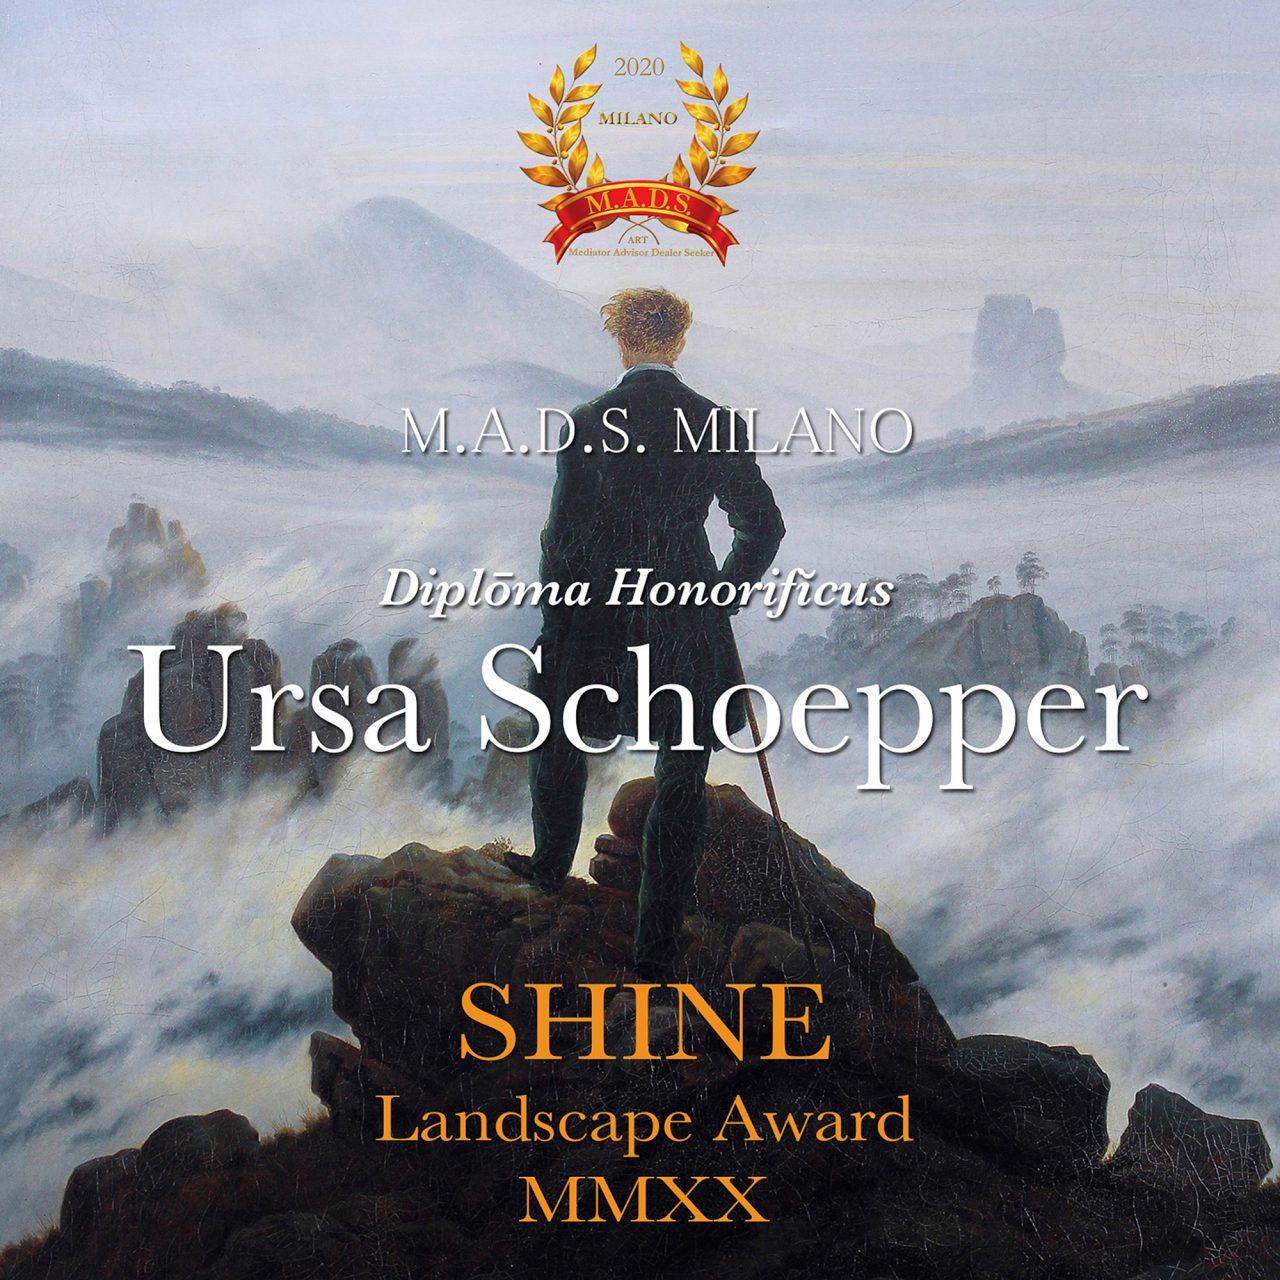 Diploma Honorificus, Shine, Landscape Award 2020